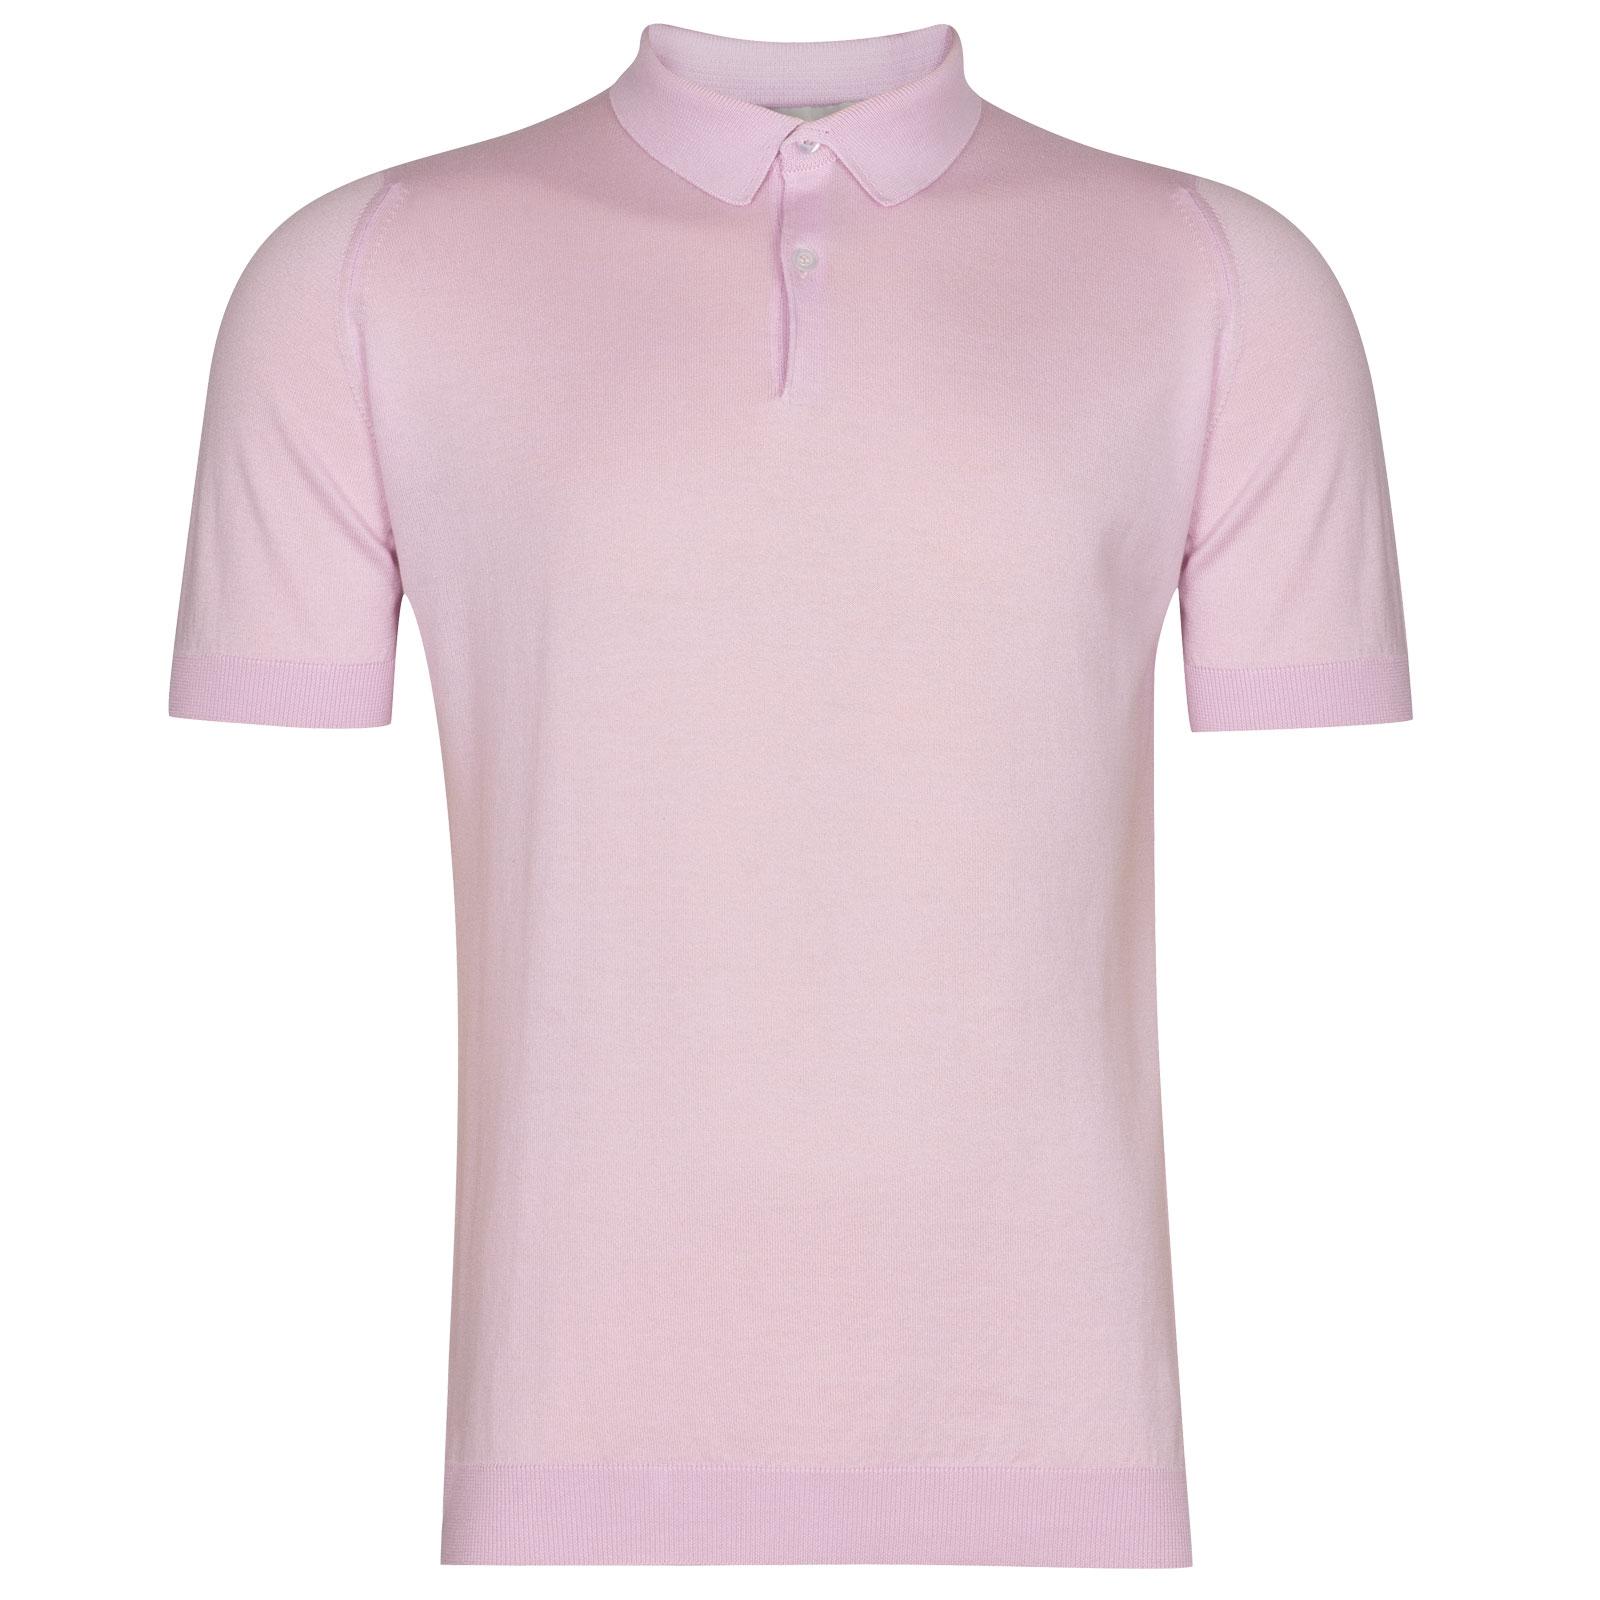 John Smedley Rhodes in Pink Blossom Shirt-LGE